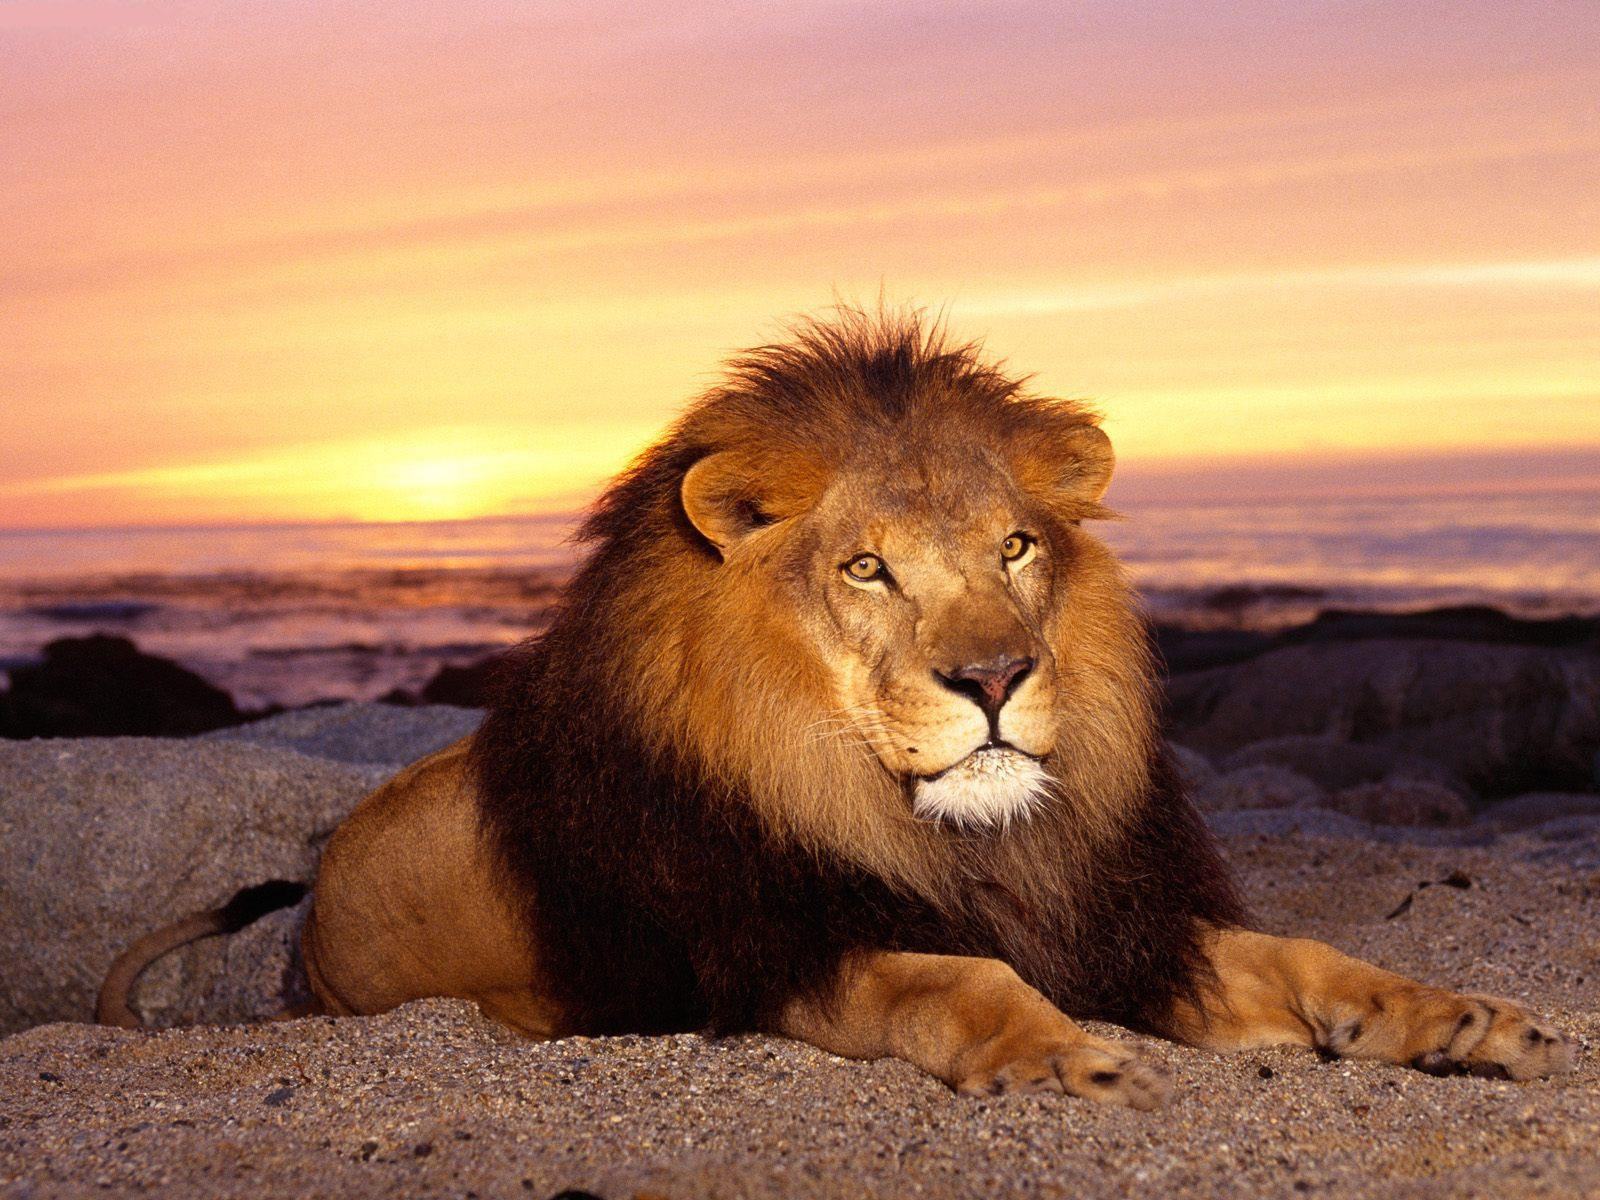 Fabulous Lions Wallpapers 521 Entertainment World 1600x1200